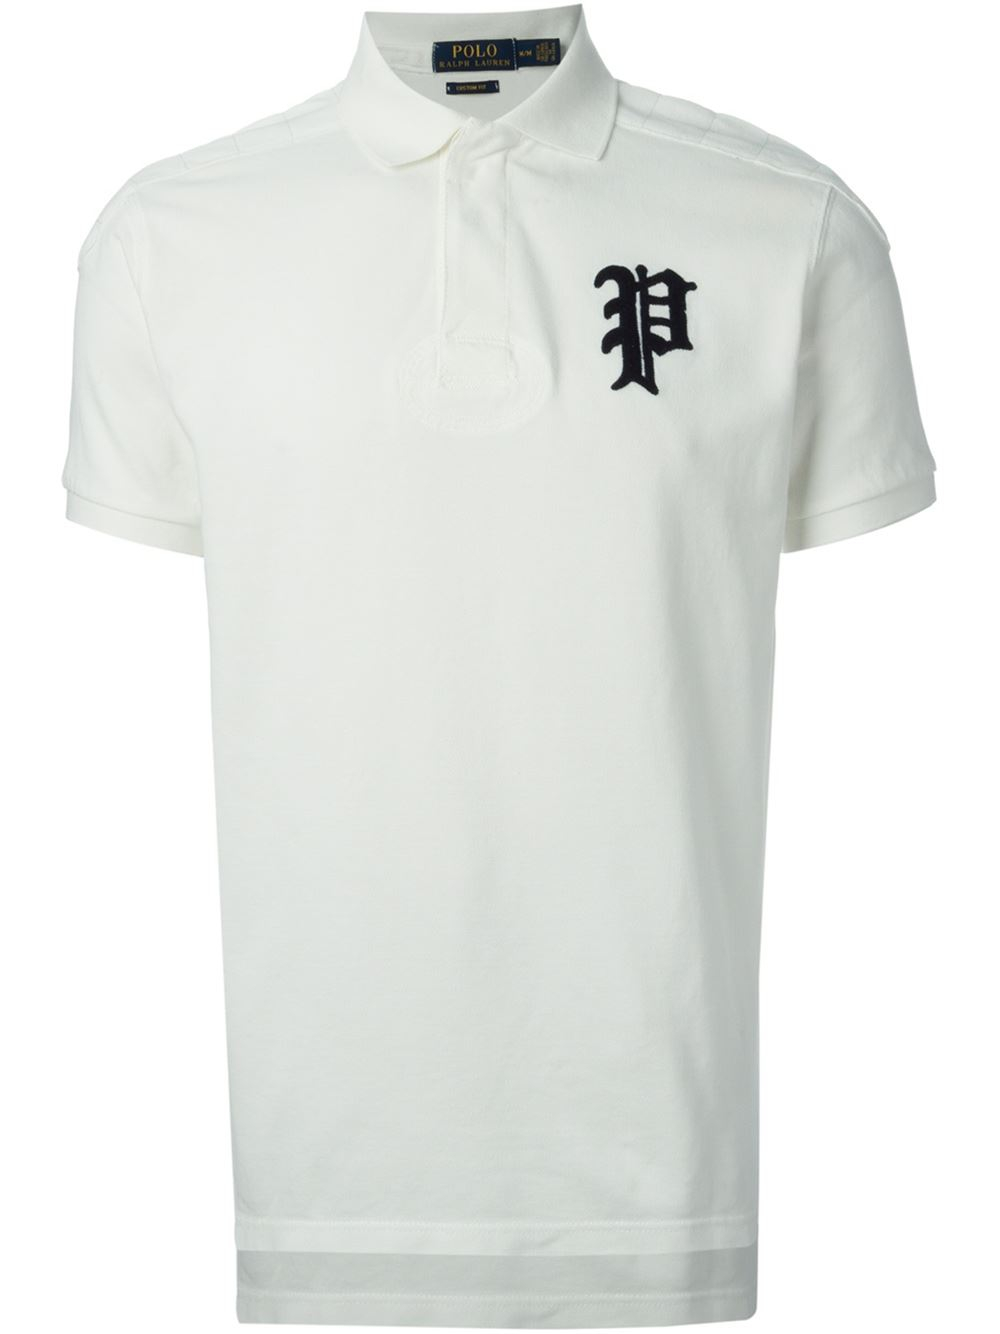 Polo ralph lauren logo polo shirt in white for men lyst for Ralph lauren logo shirt